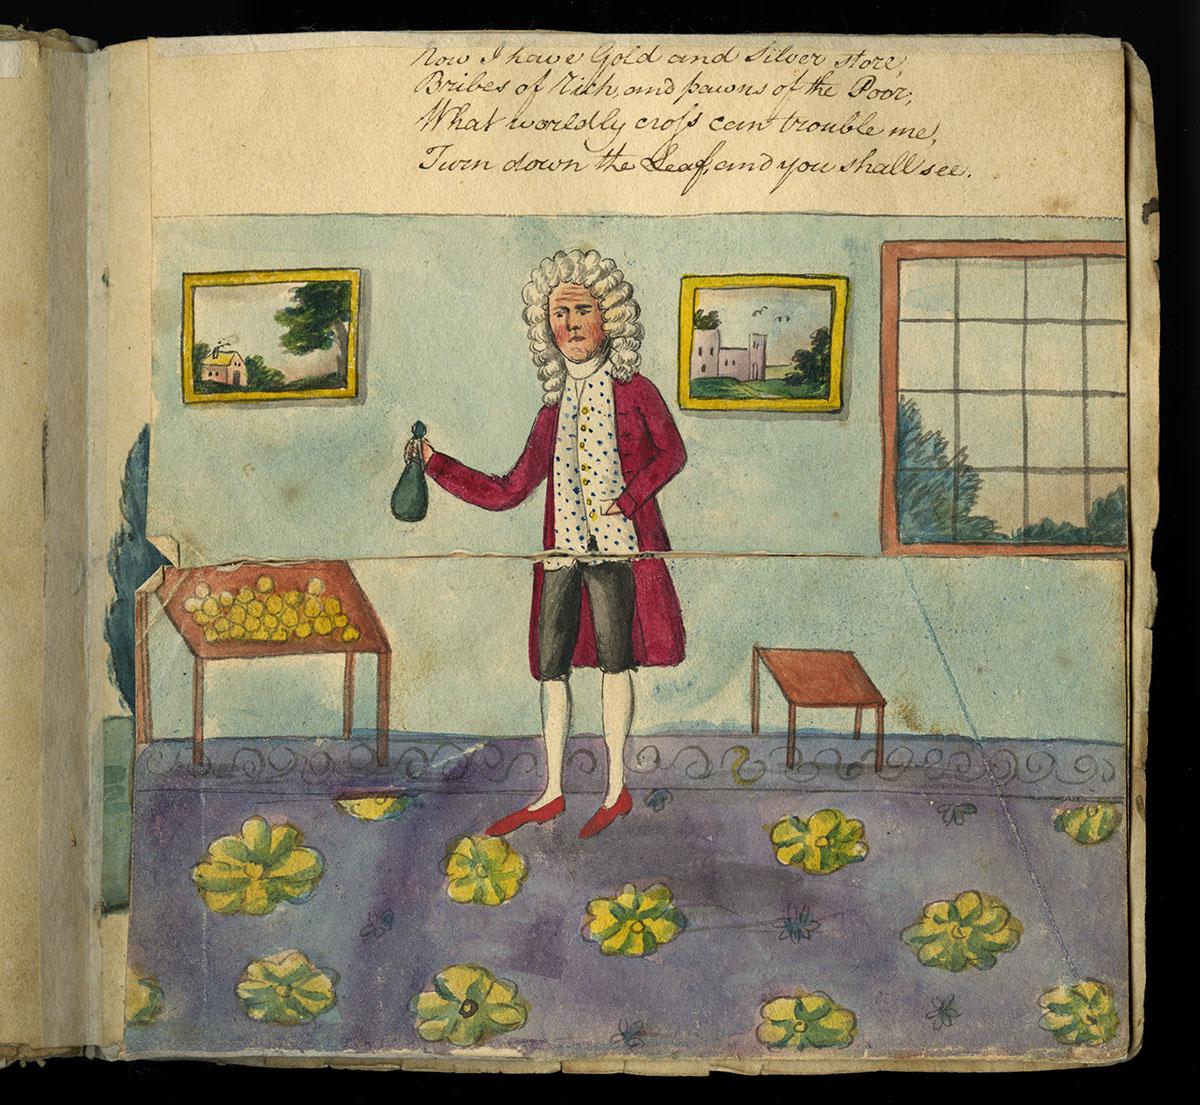 Benjamin Sands, Metamorphosis, or, A Transformation of Pictures (United States?, 1802).